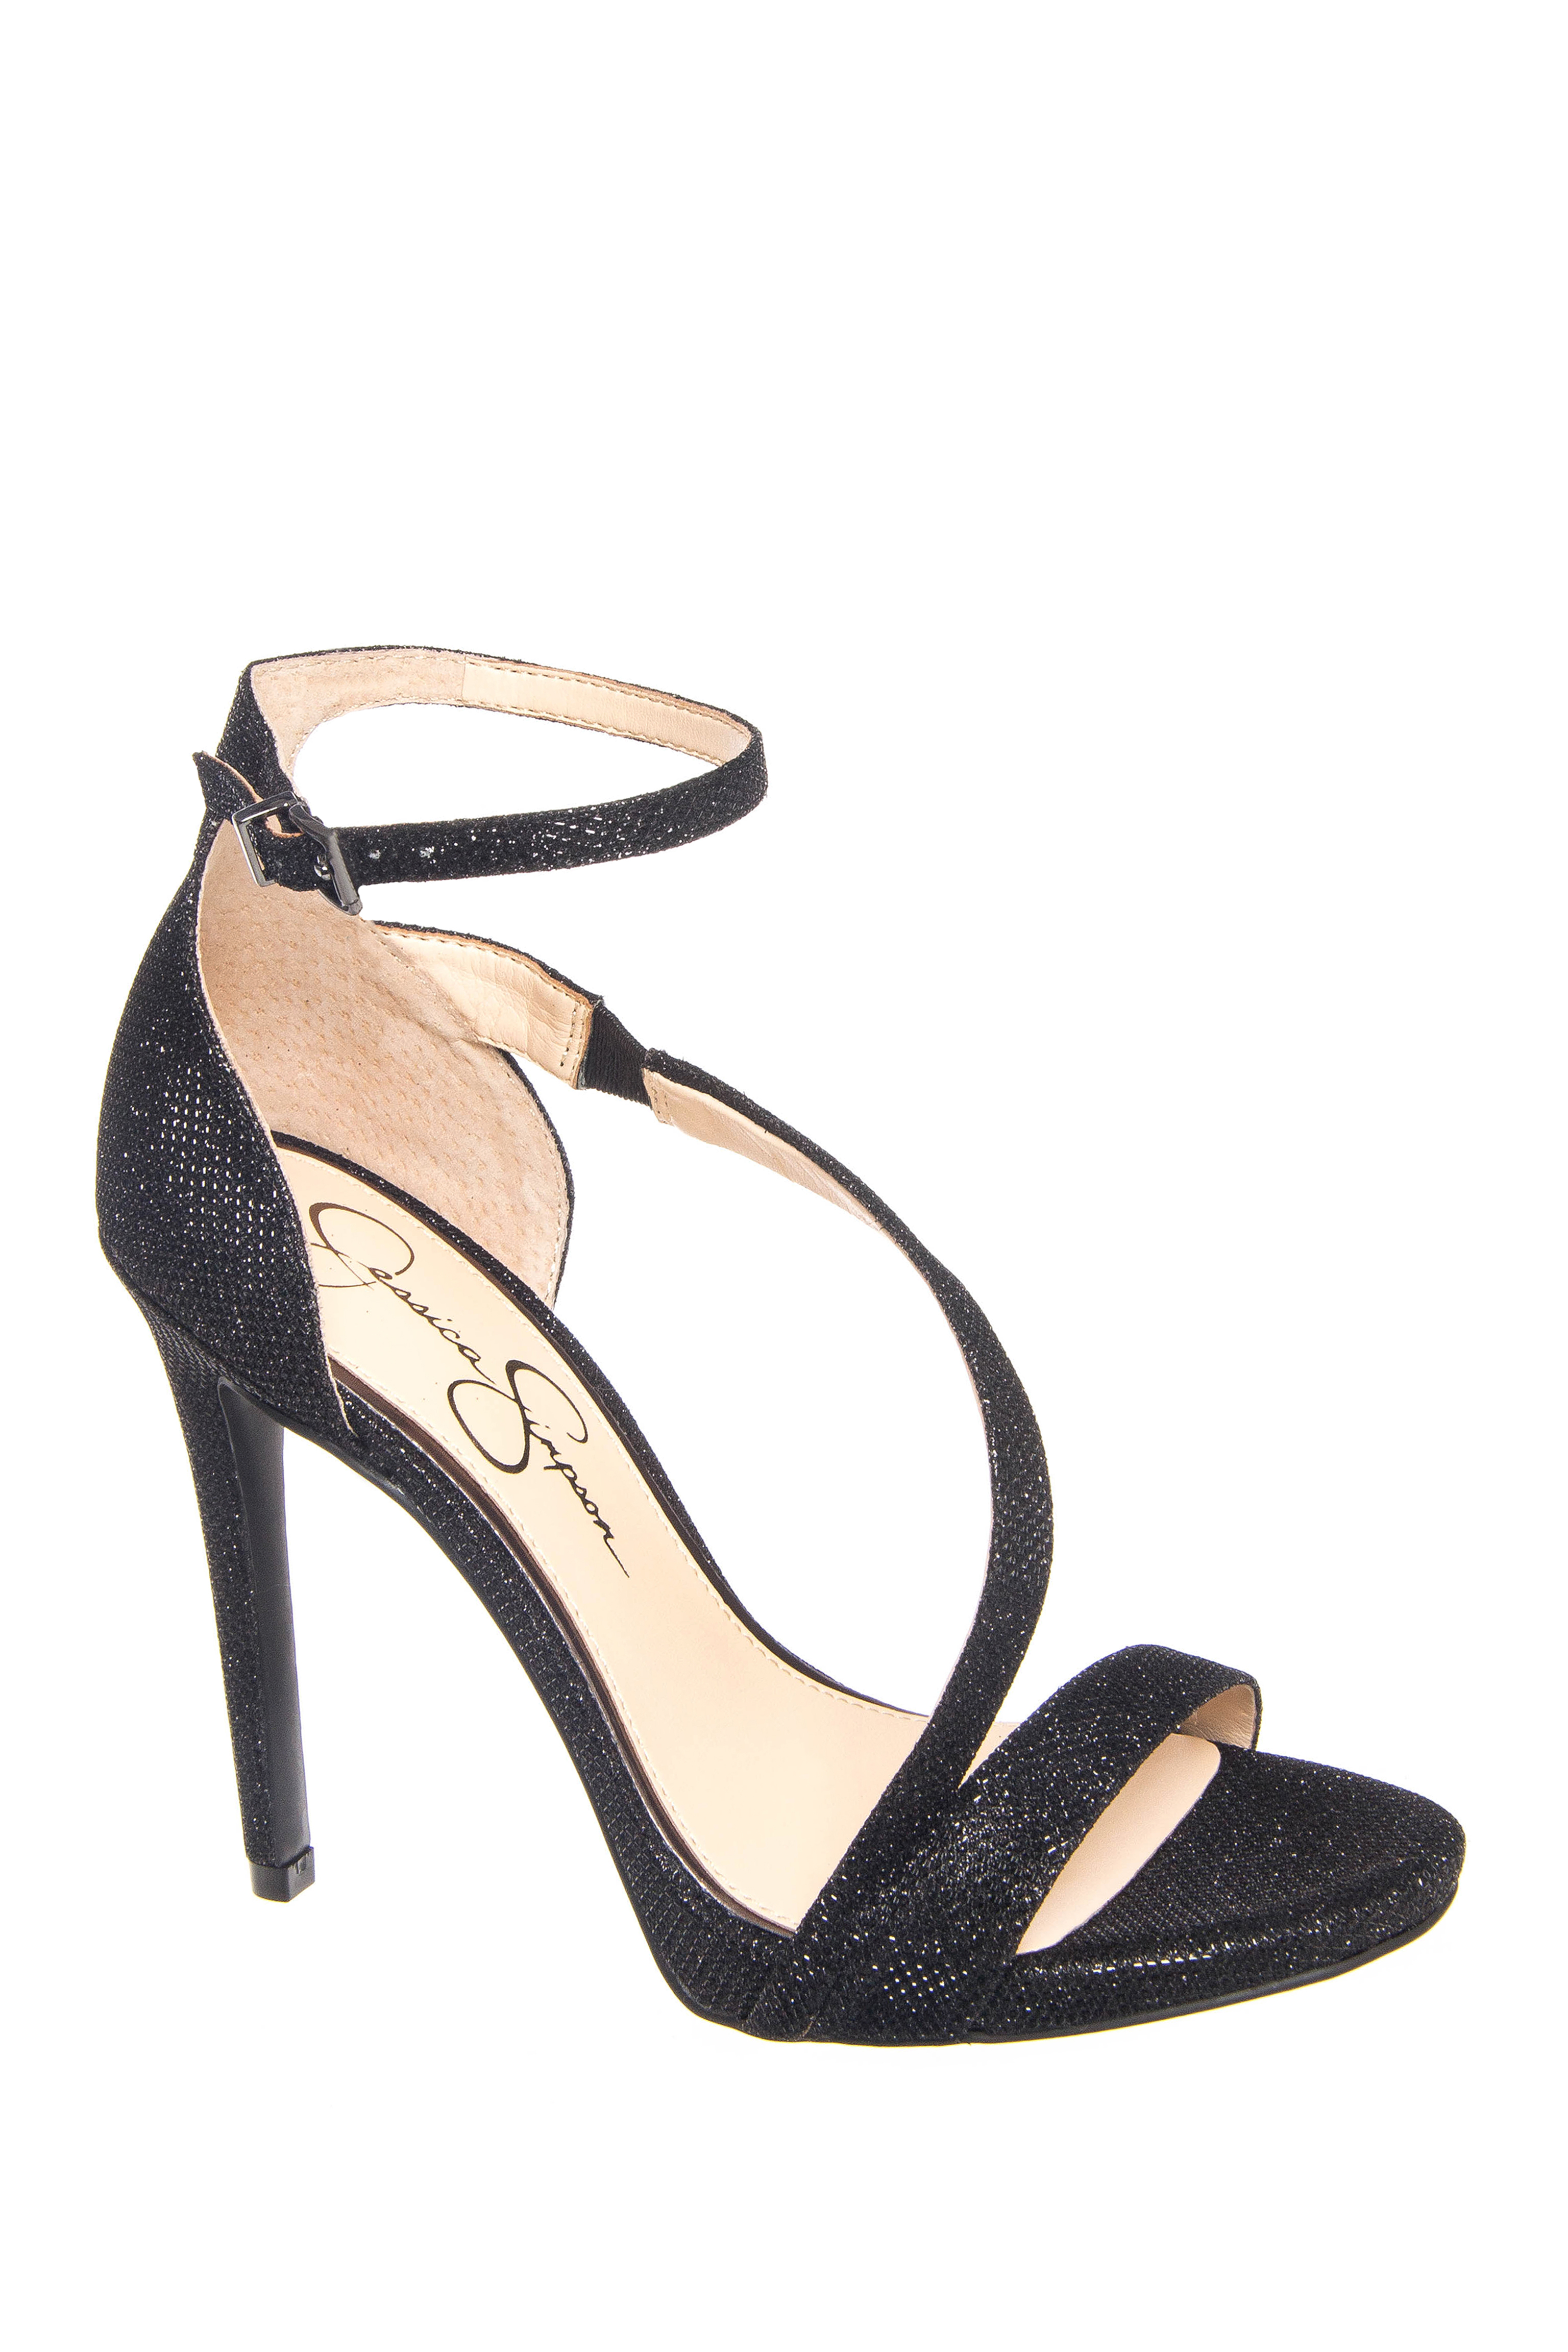 Jessica Simpson Rayli Strappy High Heel Sandals